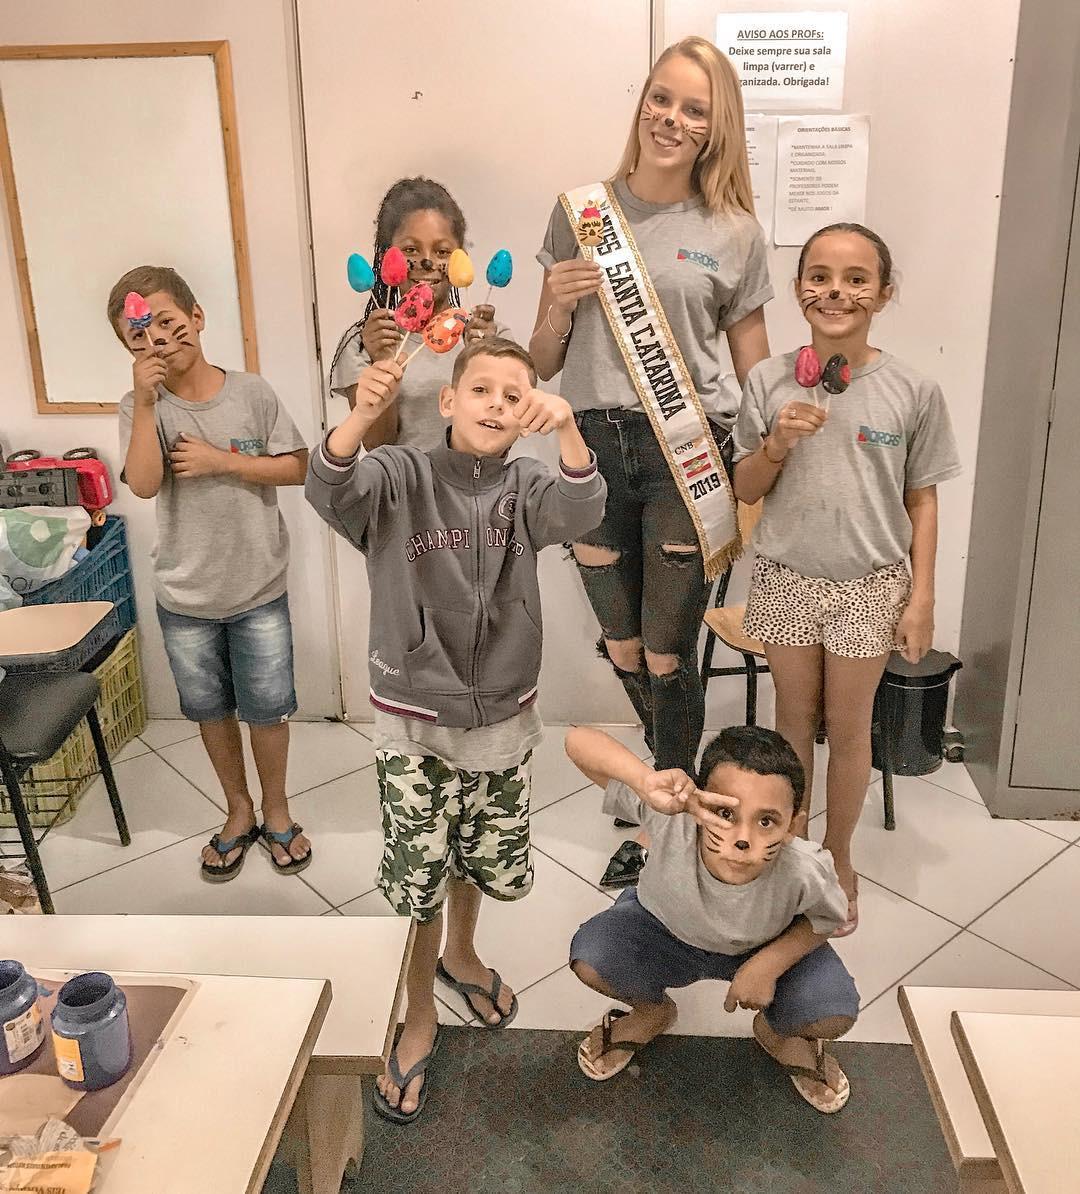 elizama aguilar, top 5 de miss brasil mundo 2019. - Página 3 Bd20zu10